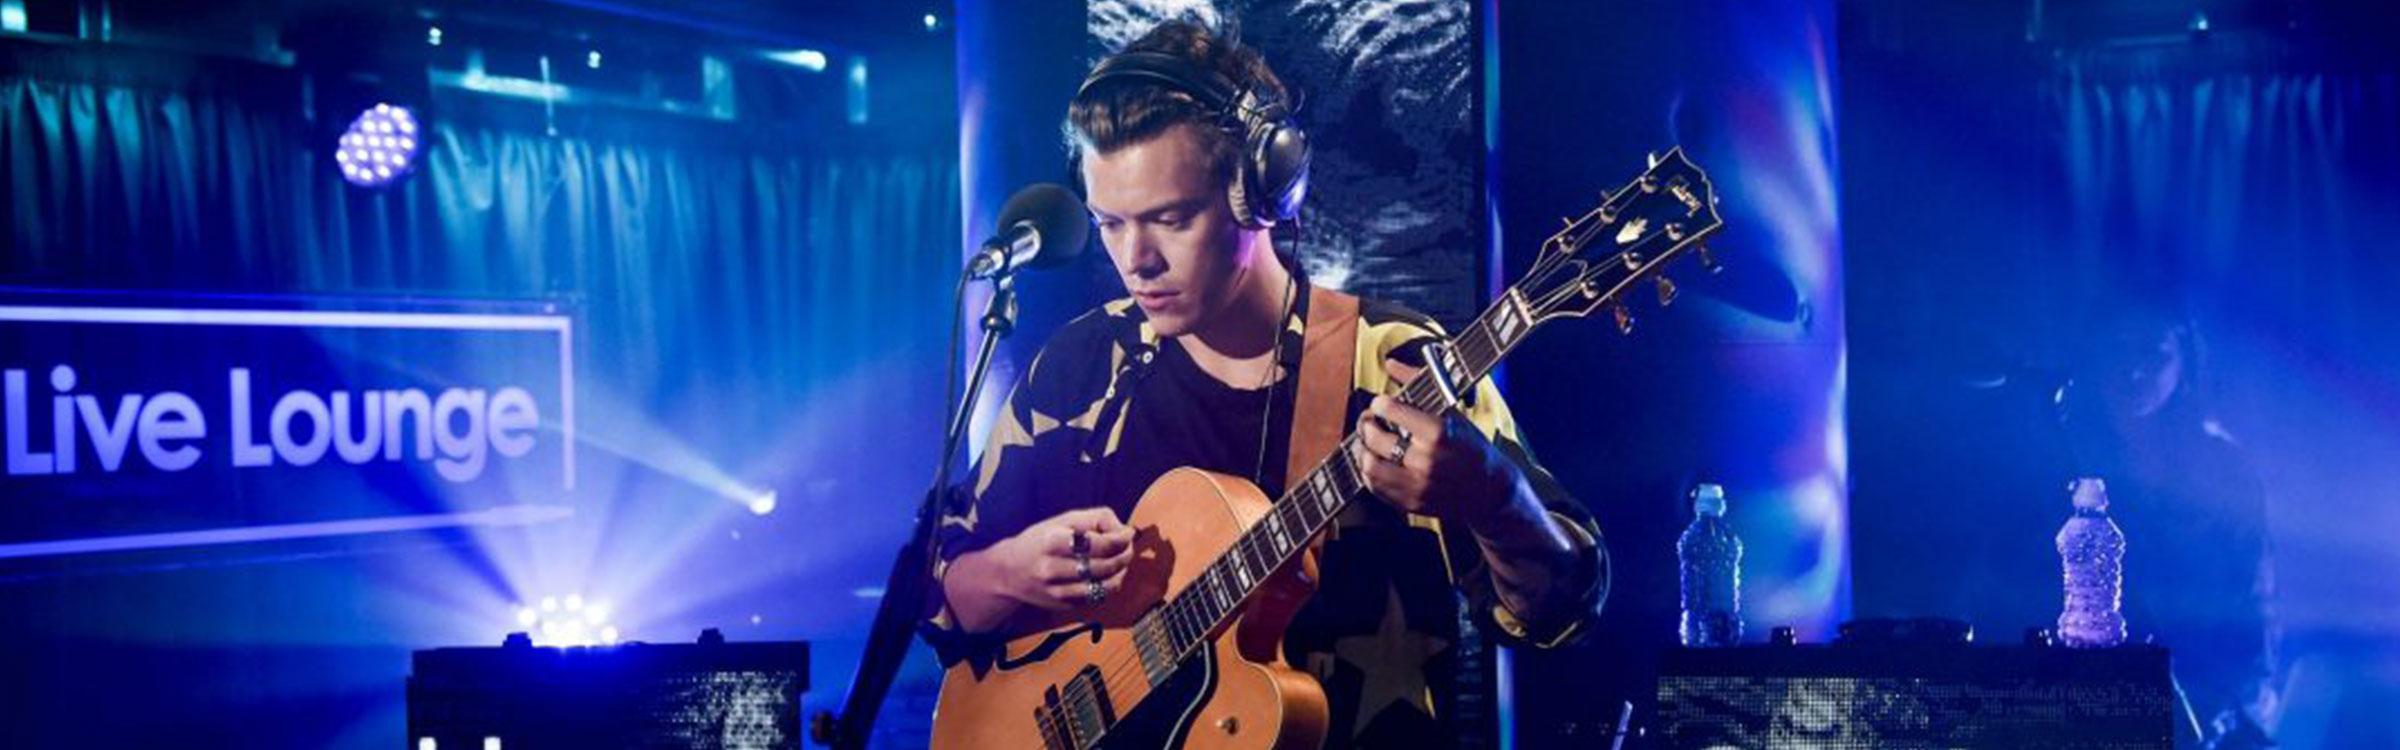 Harry styles bbc header